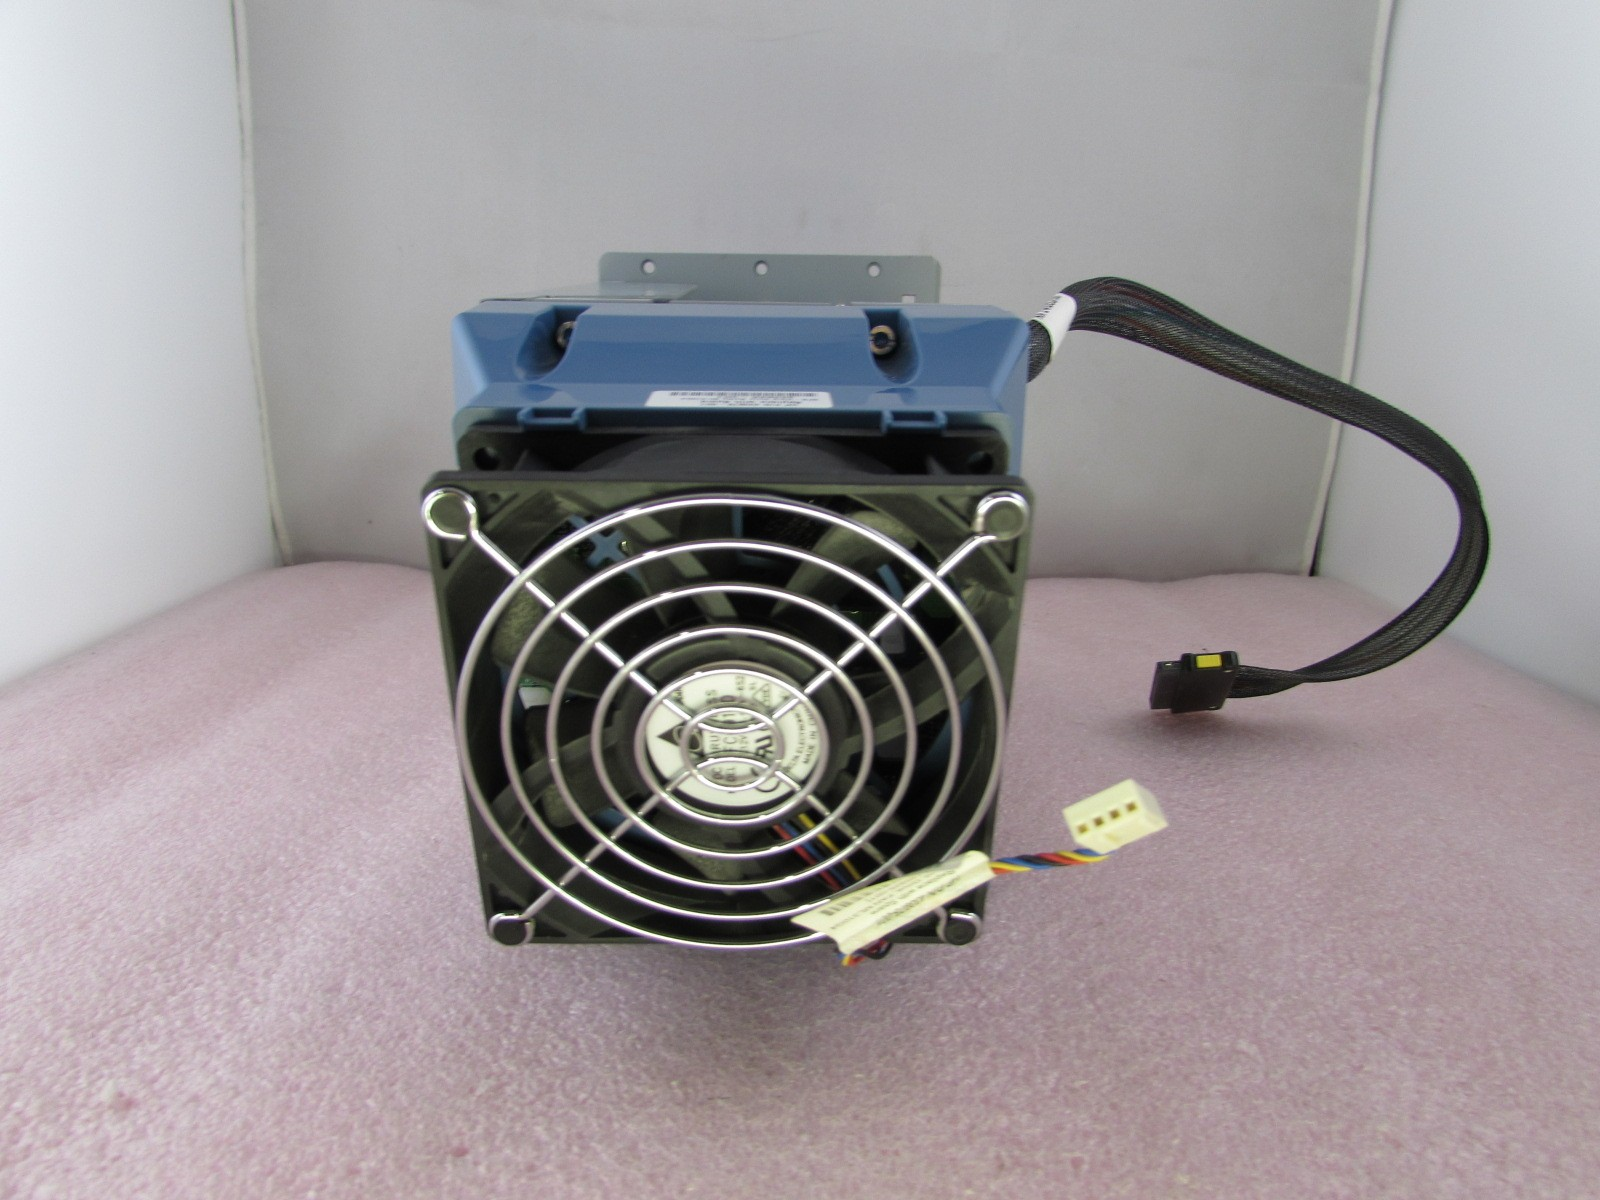 Hdd Cage Fan